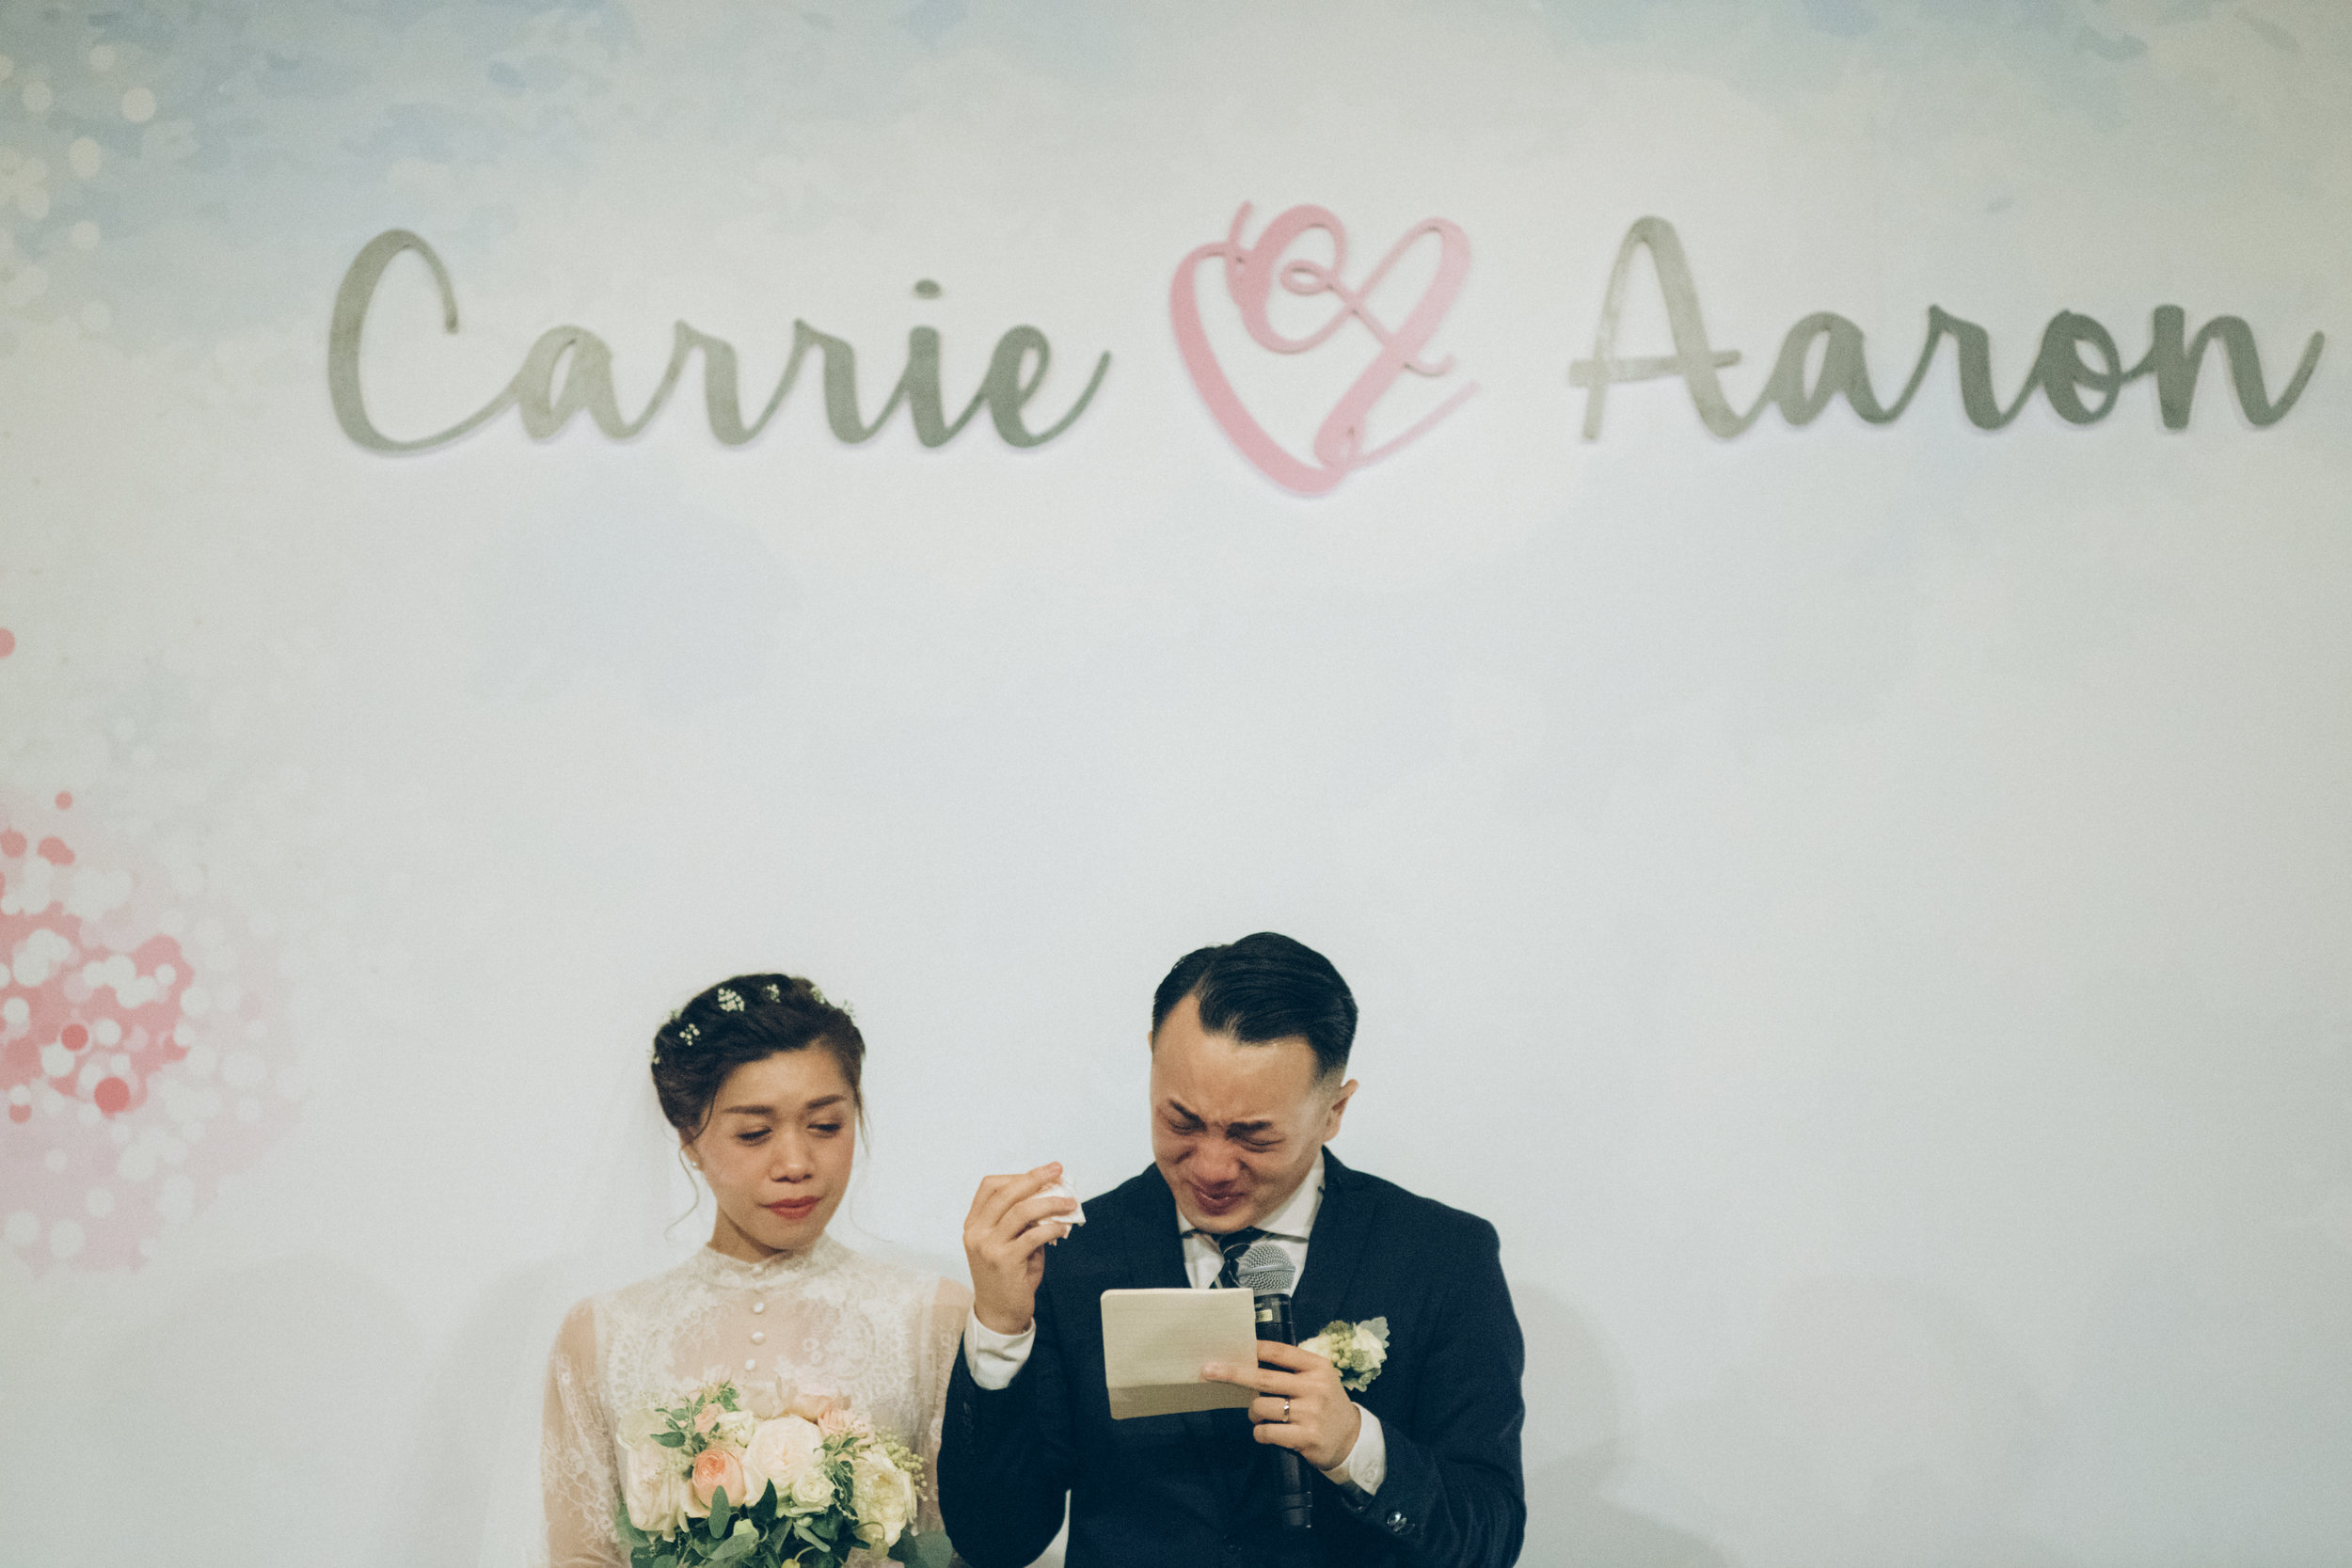 Carrie & Aaron-527.jpg